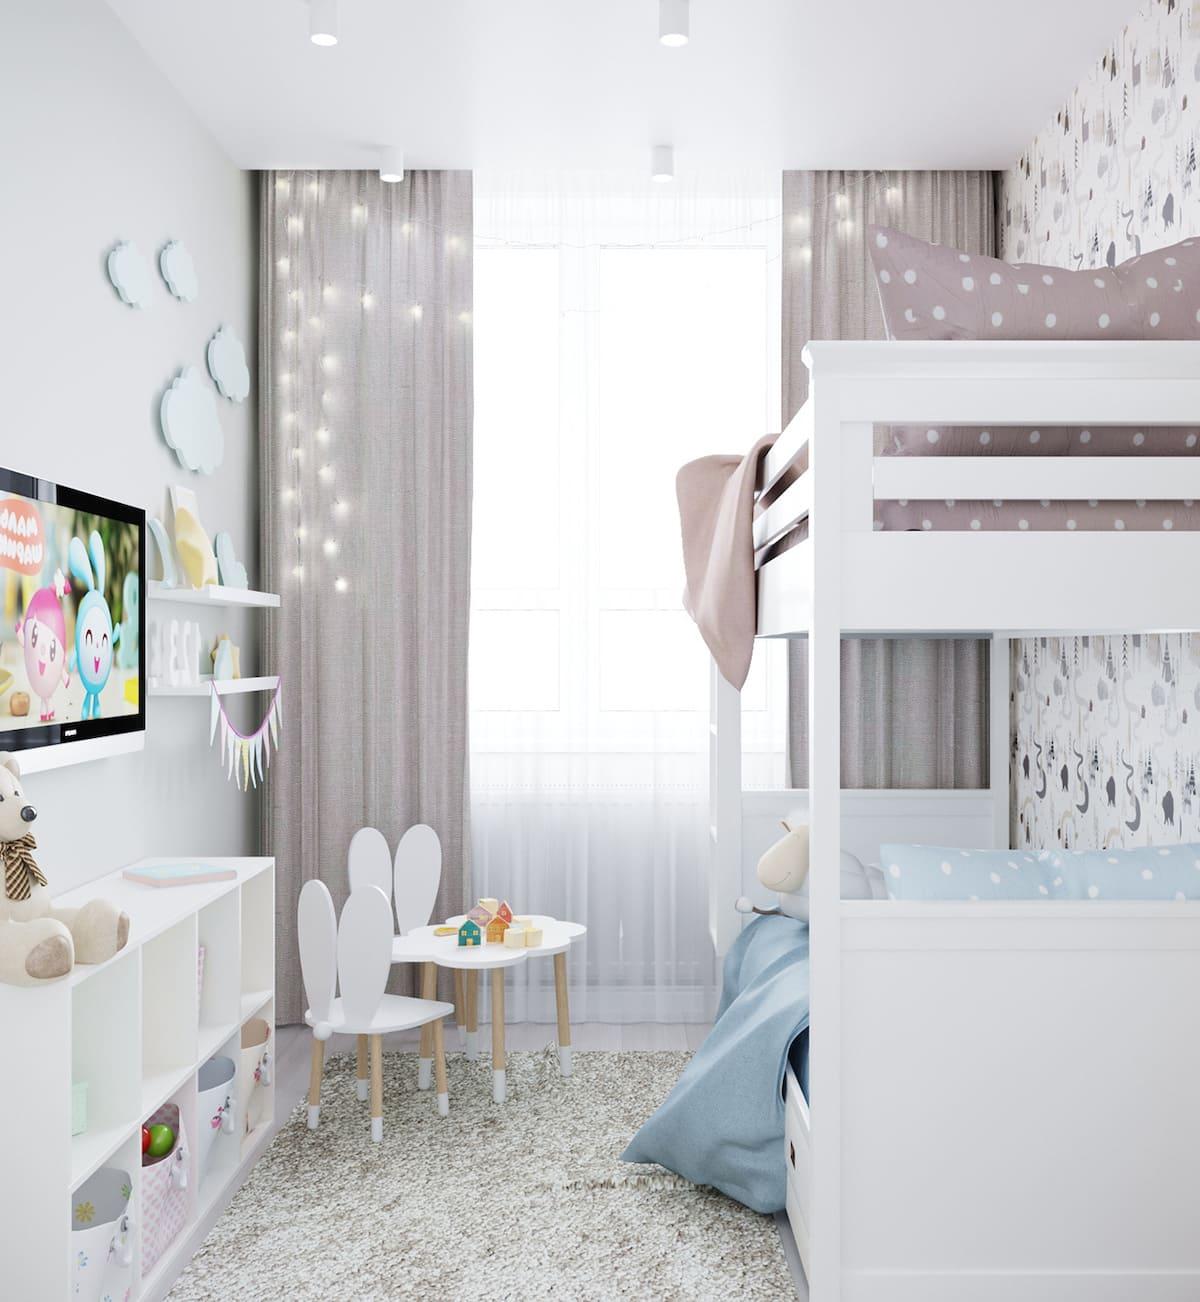 интерьер детской комнаты фото 7